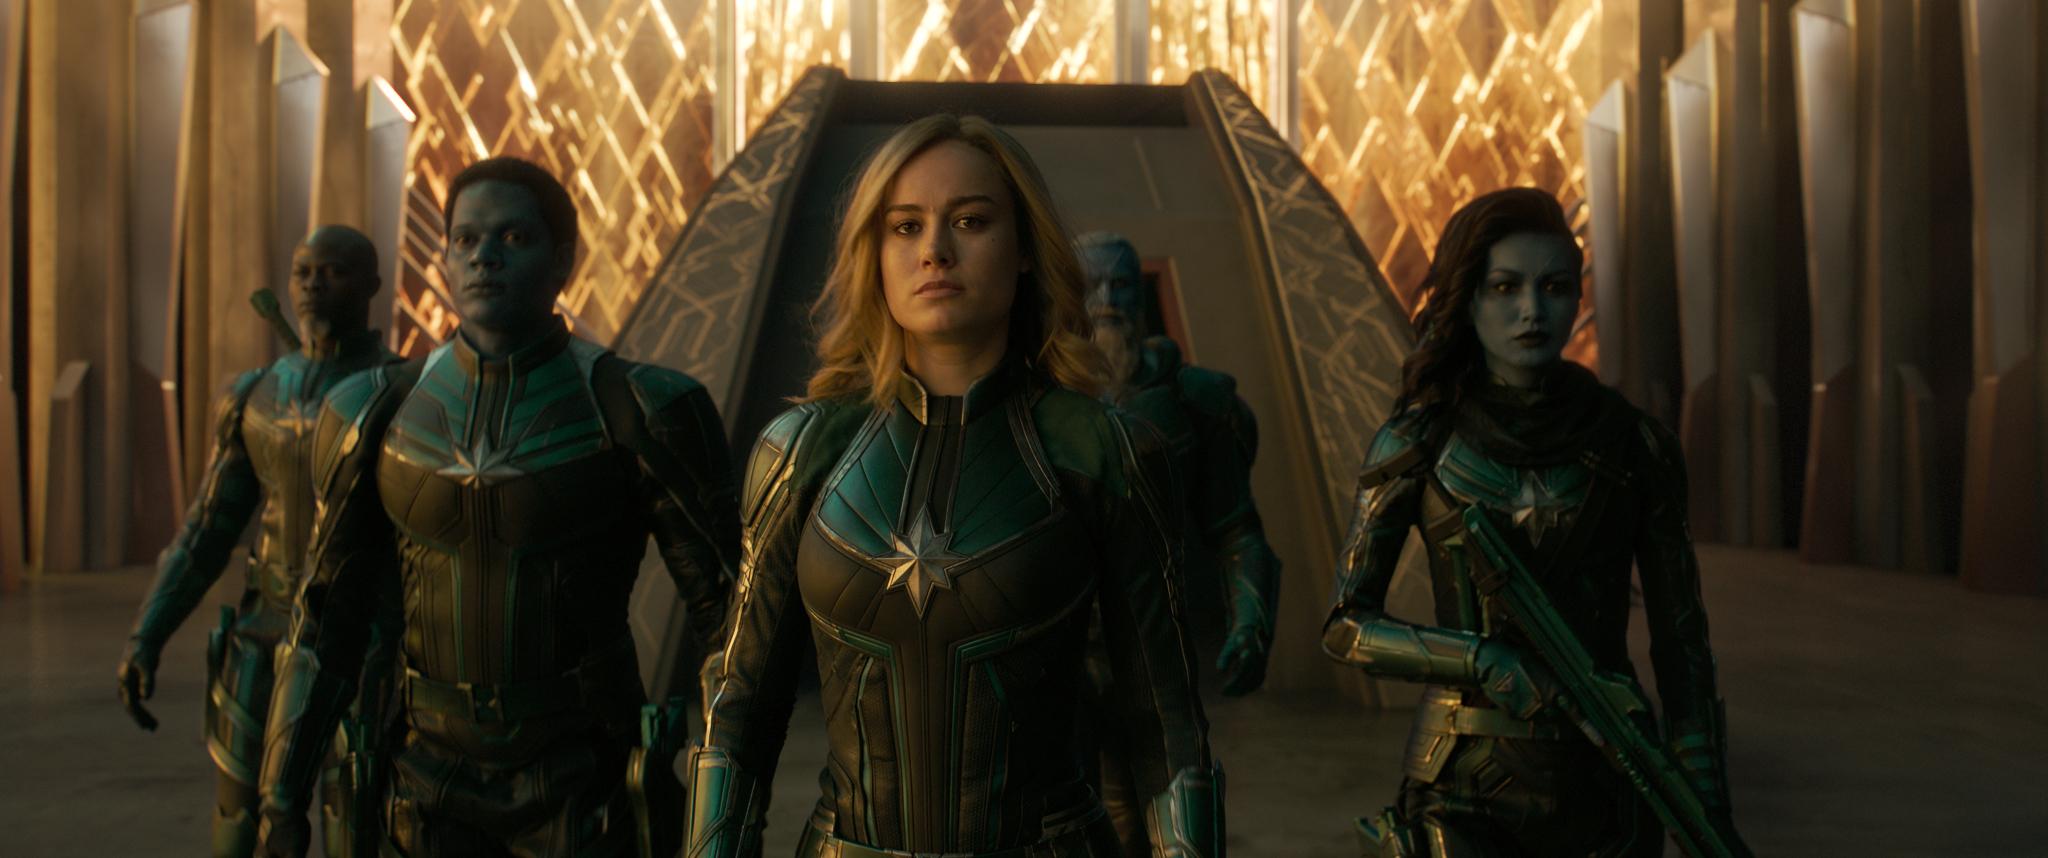 L to R: Korath (Djimon Hounsou), Att-Lass (Algenis Perez Soto), Carol Danvers/Captain Marvel (Brie Larson), Bron-Char (Rune Temte) and Minn-Erva (Gemma Chan)